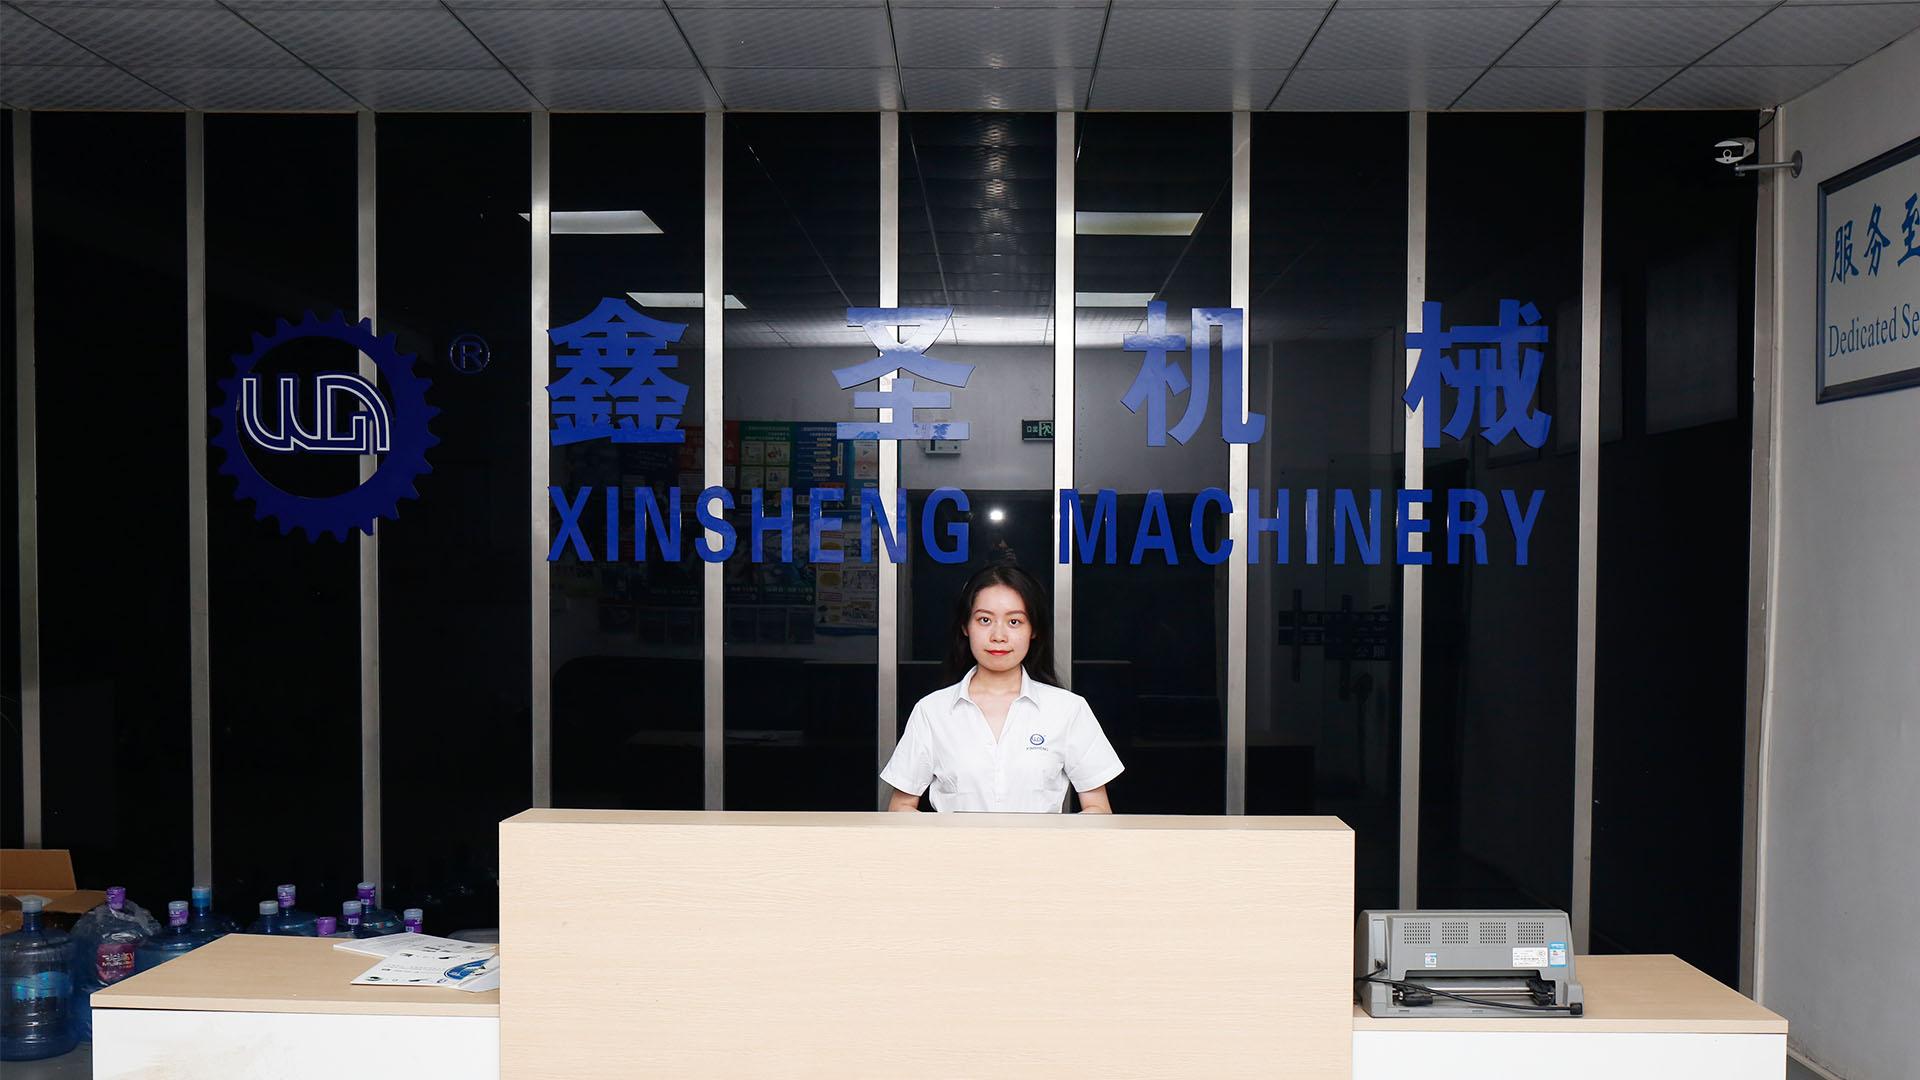 Produsen Mesin Bending Kawat Profesional membentuk Cina